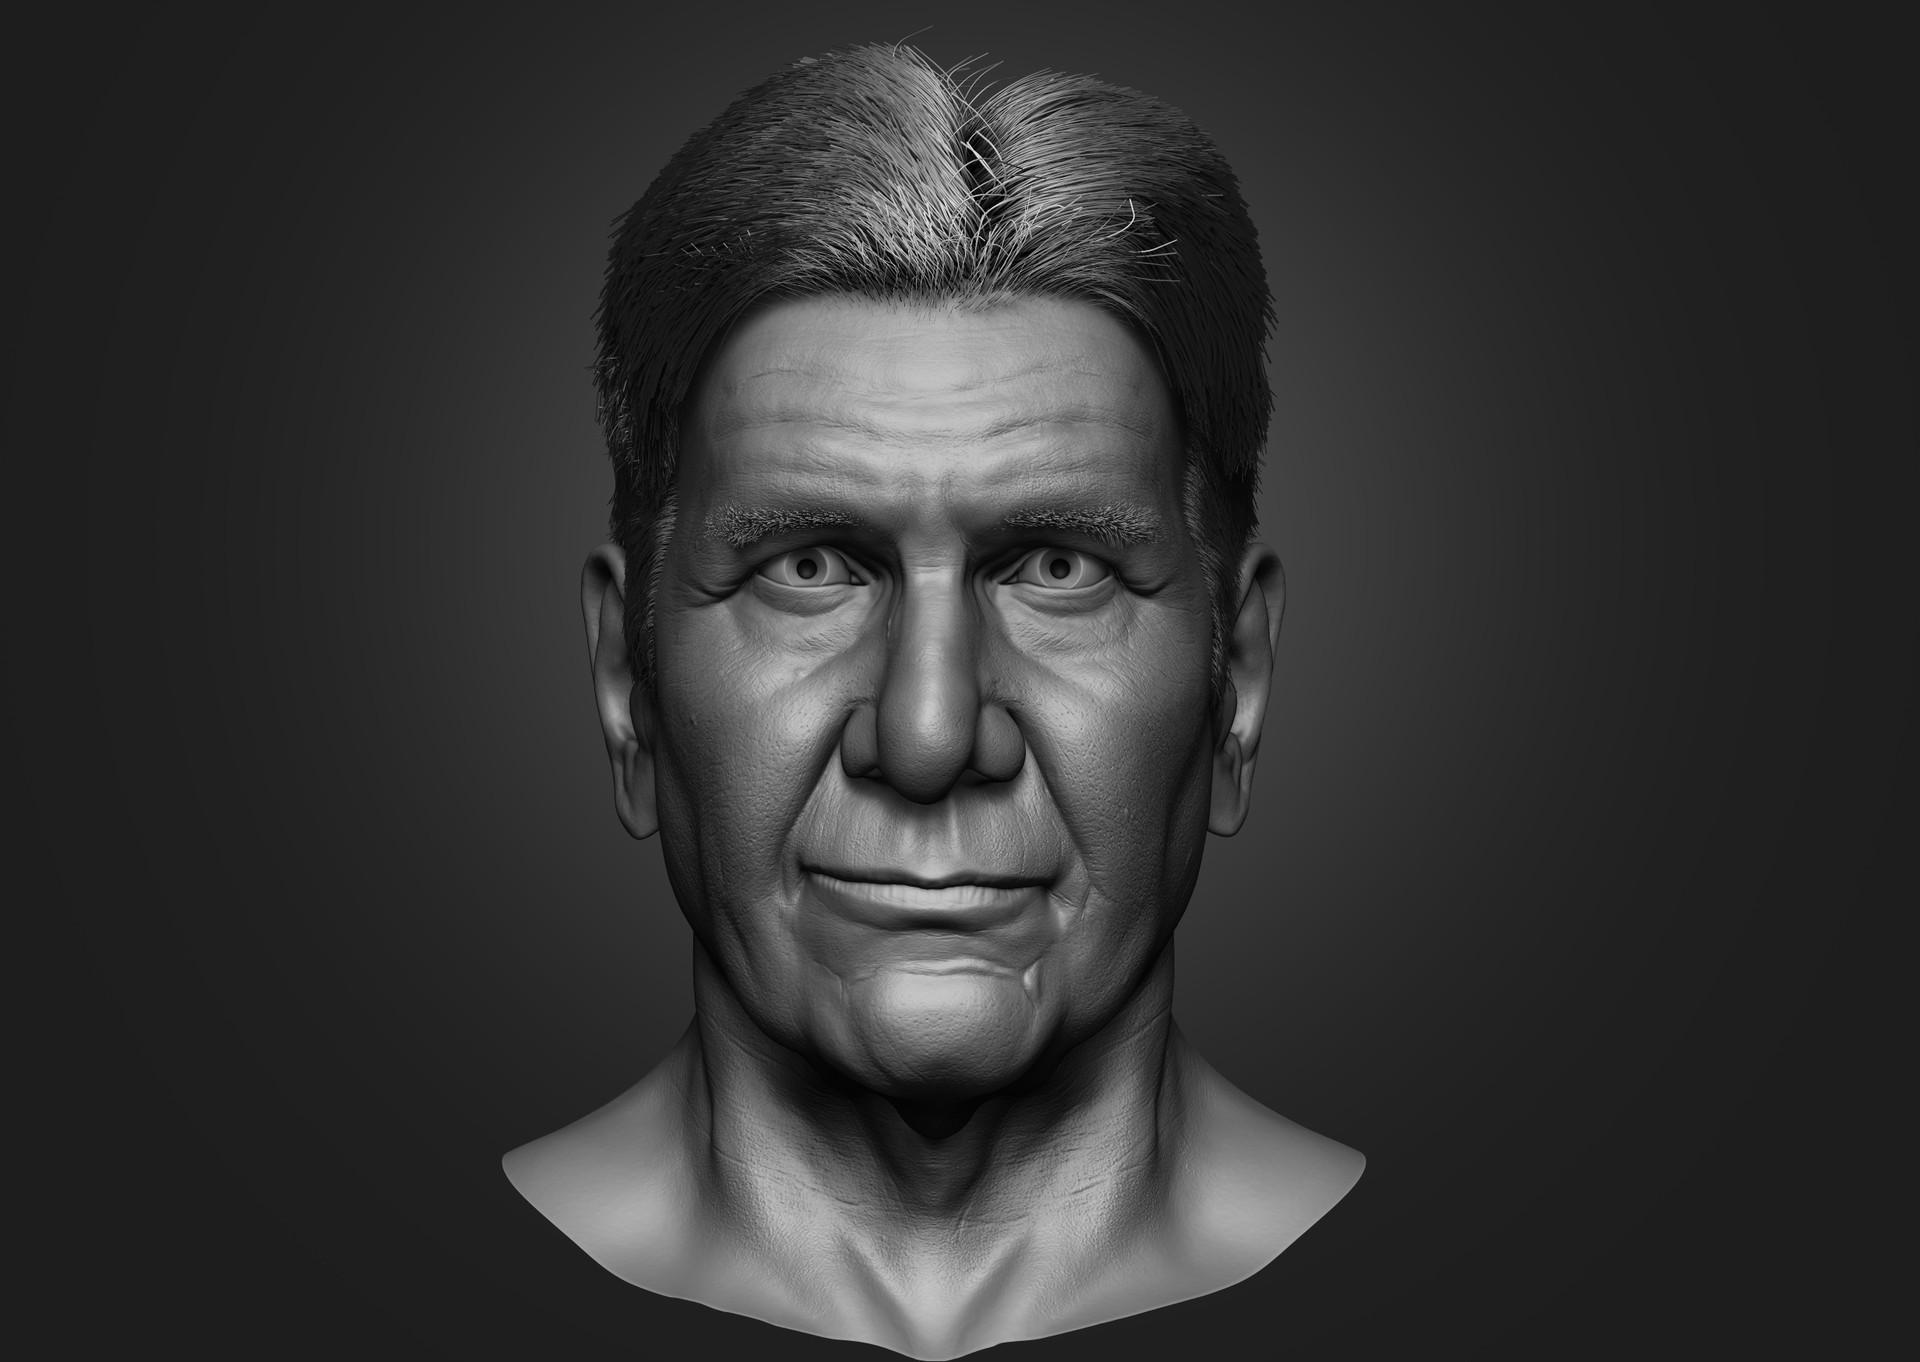 Dhananjay Naidu Facial Anatomy And Likeness Study